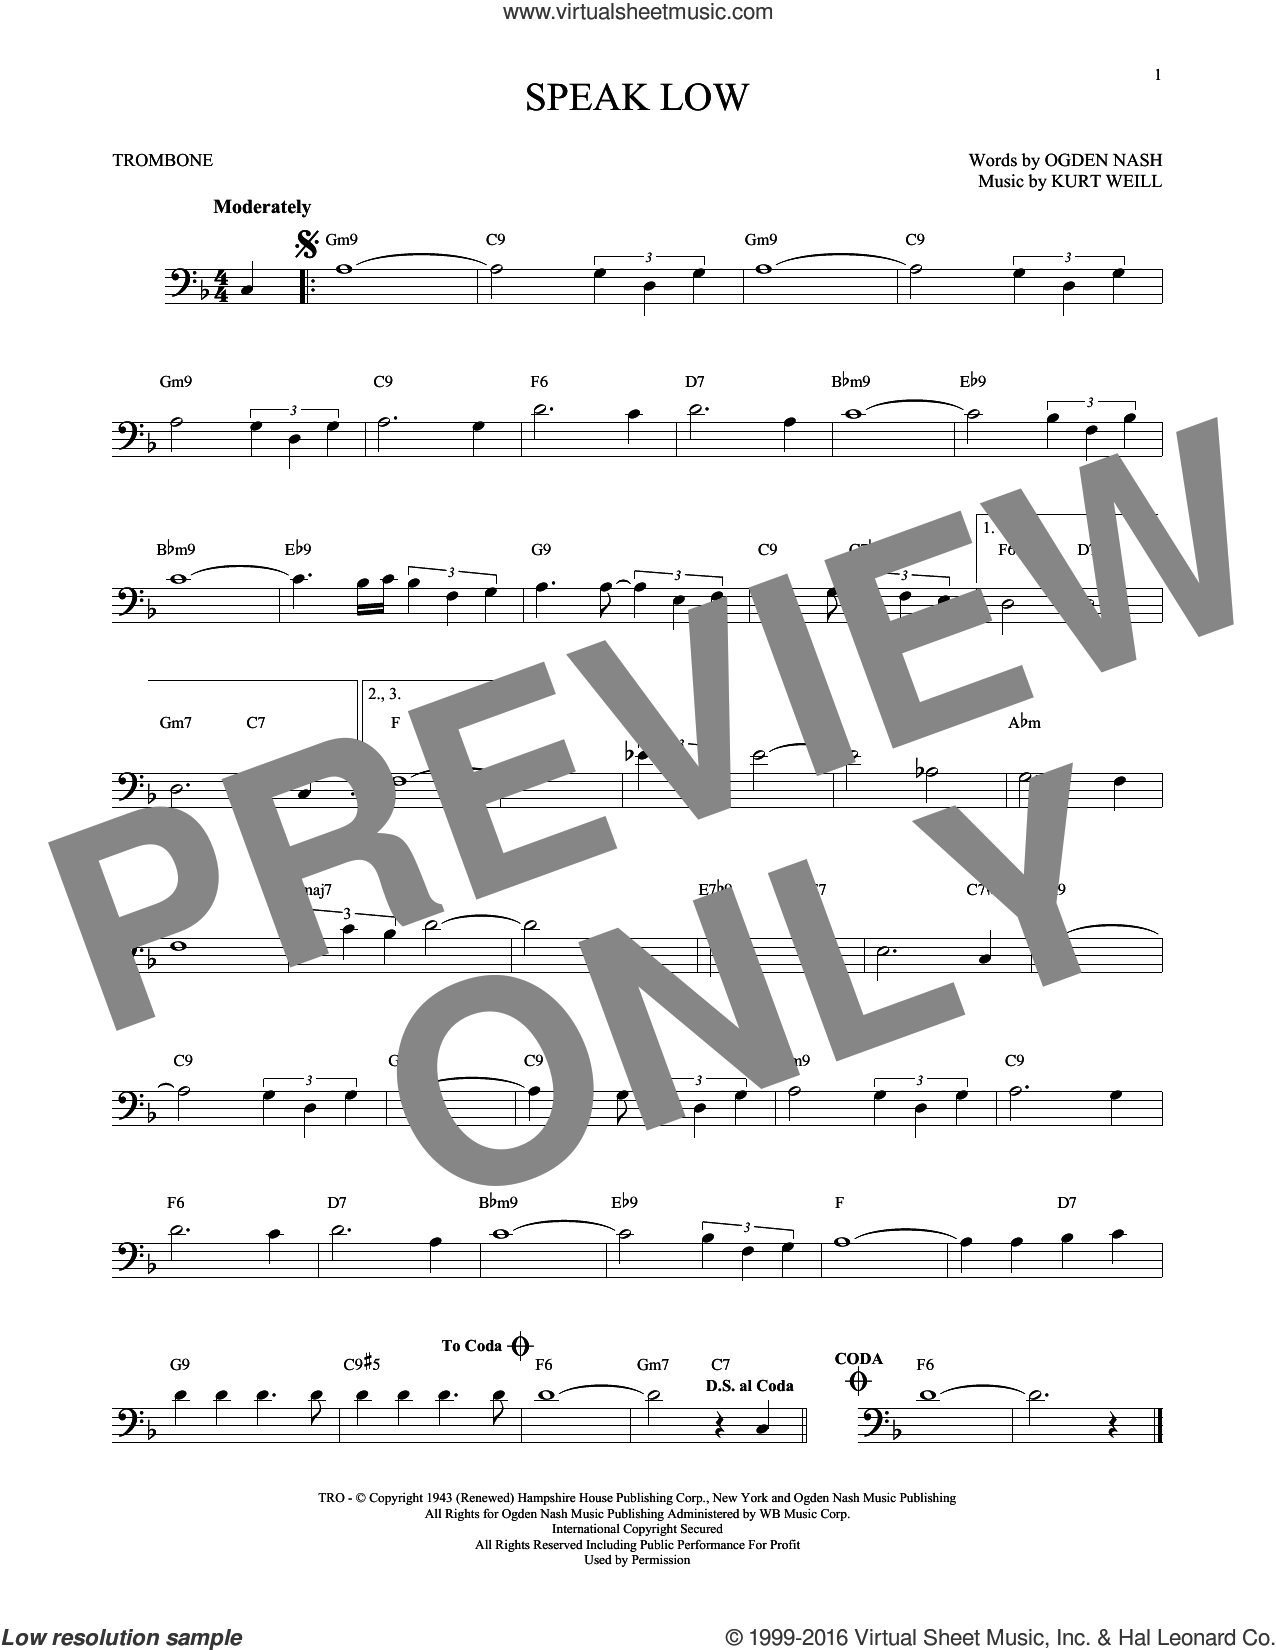 Speak Low sheet music for trombone solo by Kurt Weill and Ogden Nash, intermediate skill level